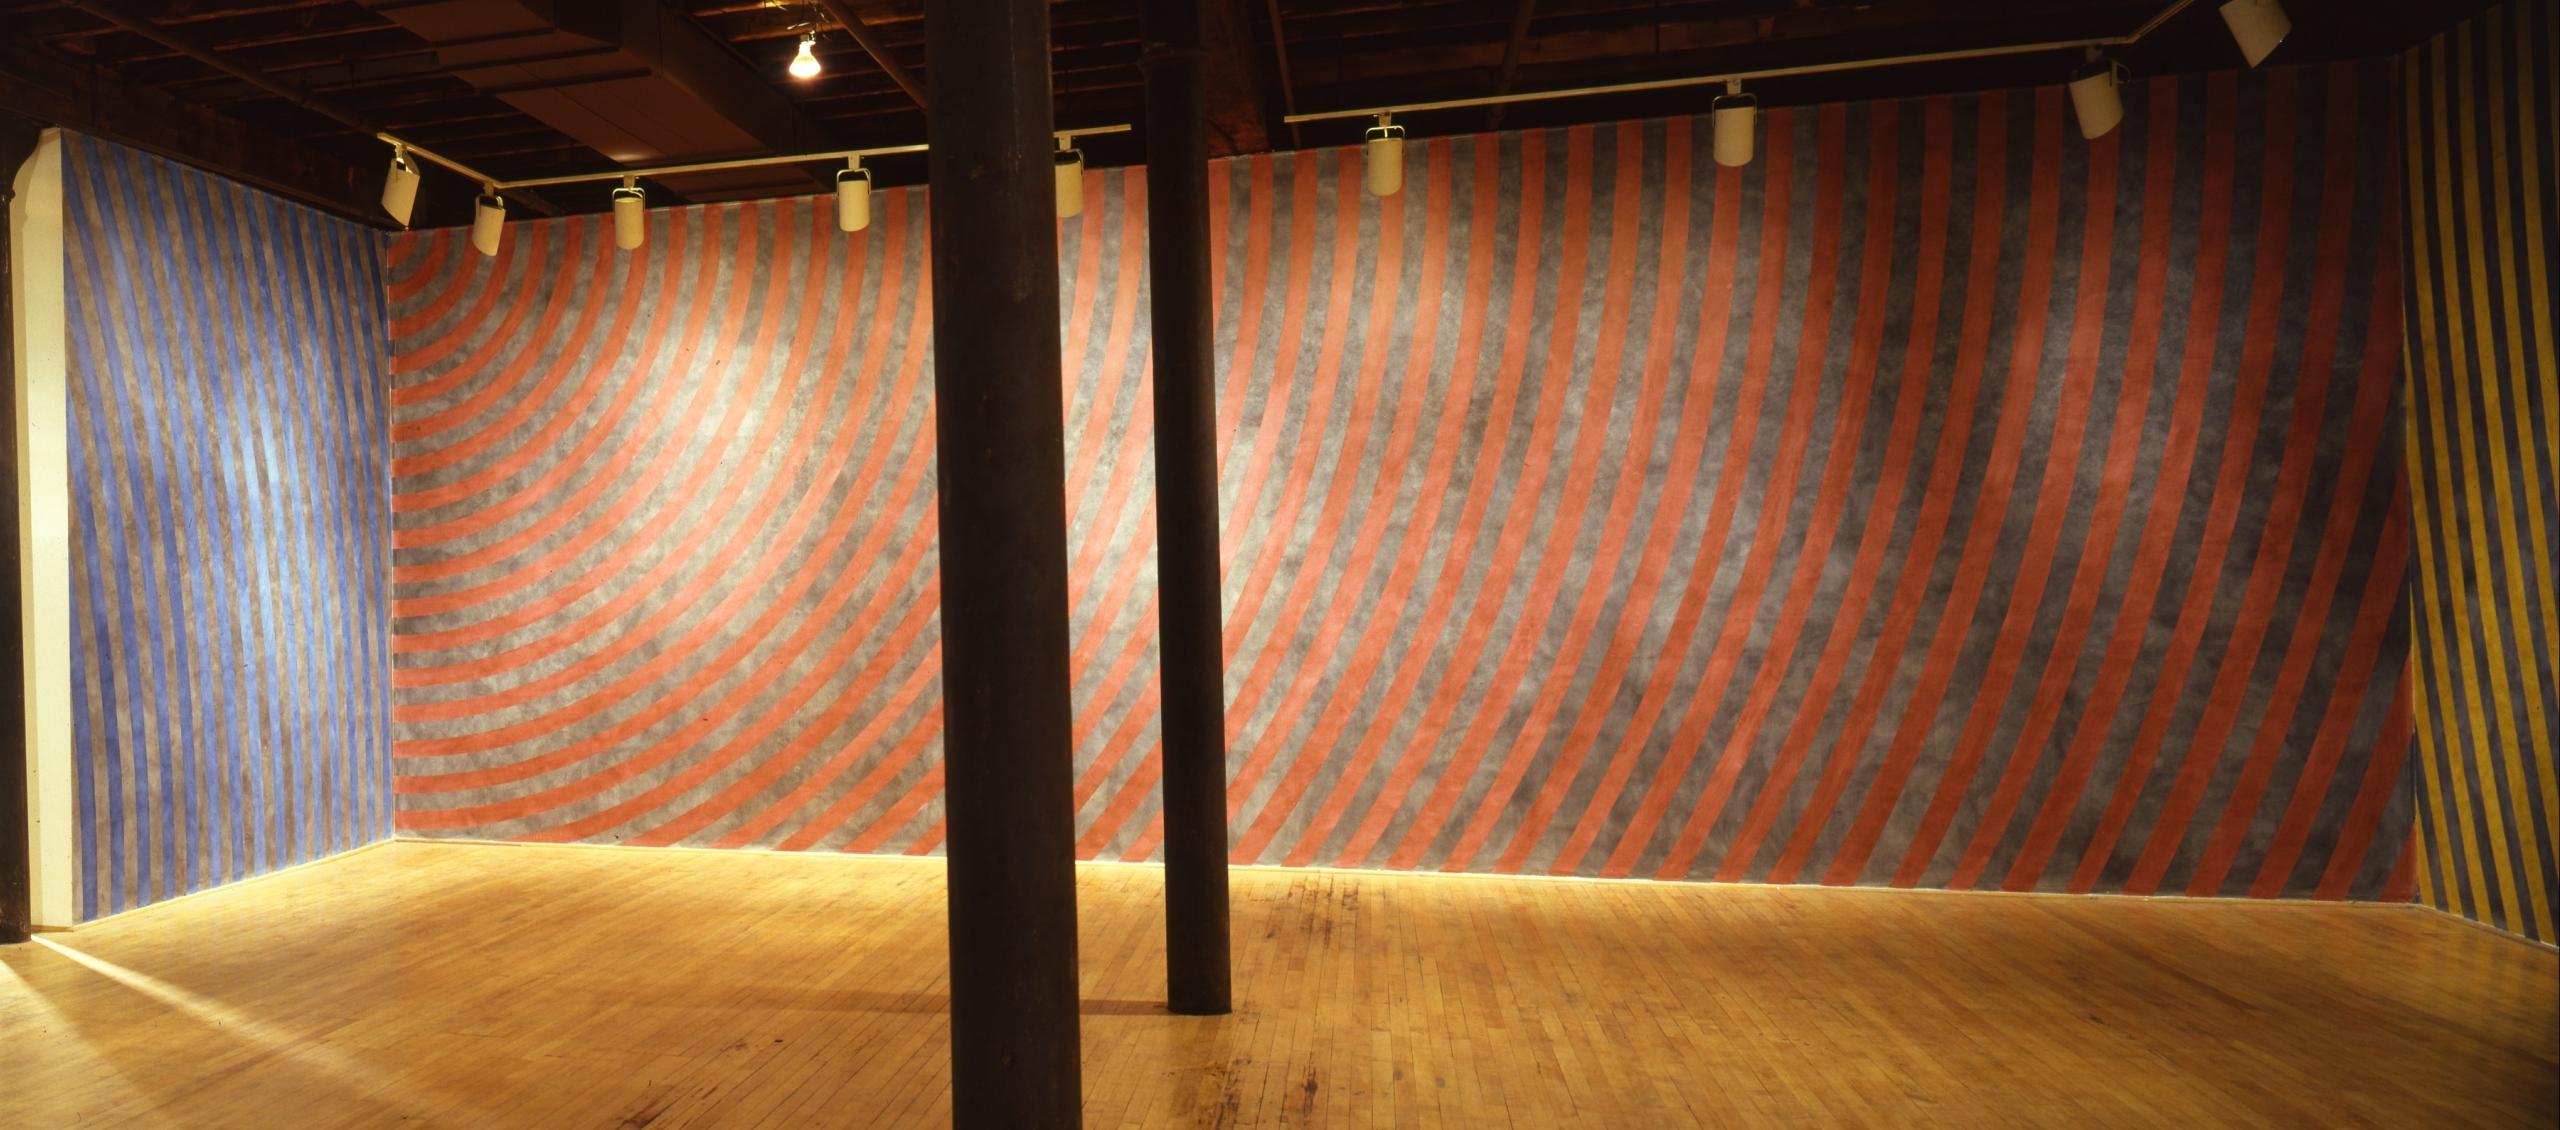 Installation view at Rhona Hoffman Gallery, Sol LeWitt, New Wall Paintings, 1986